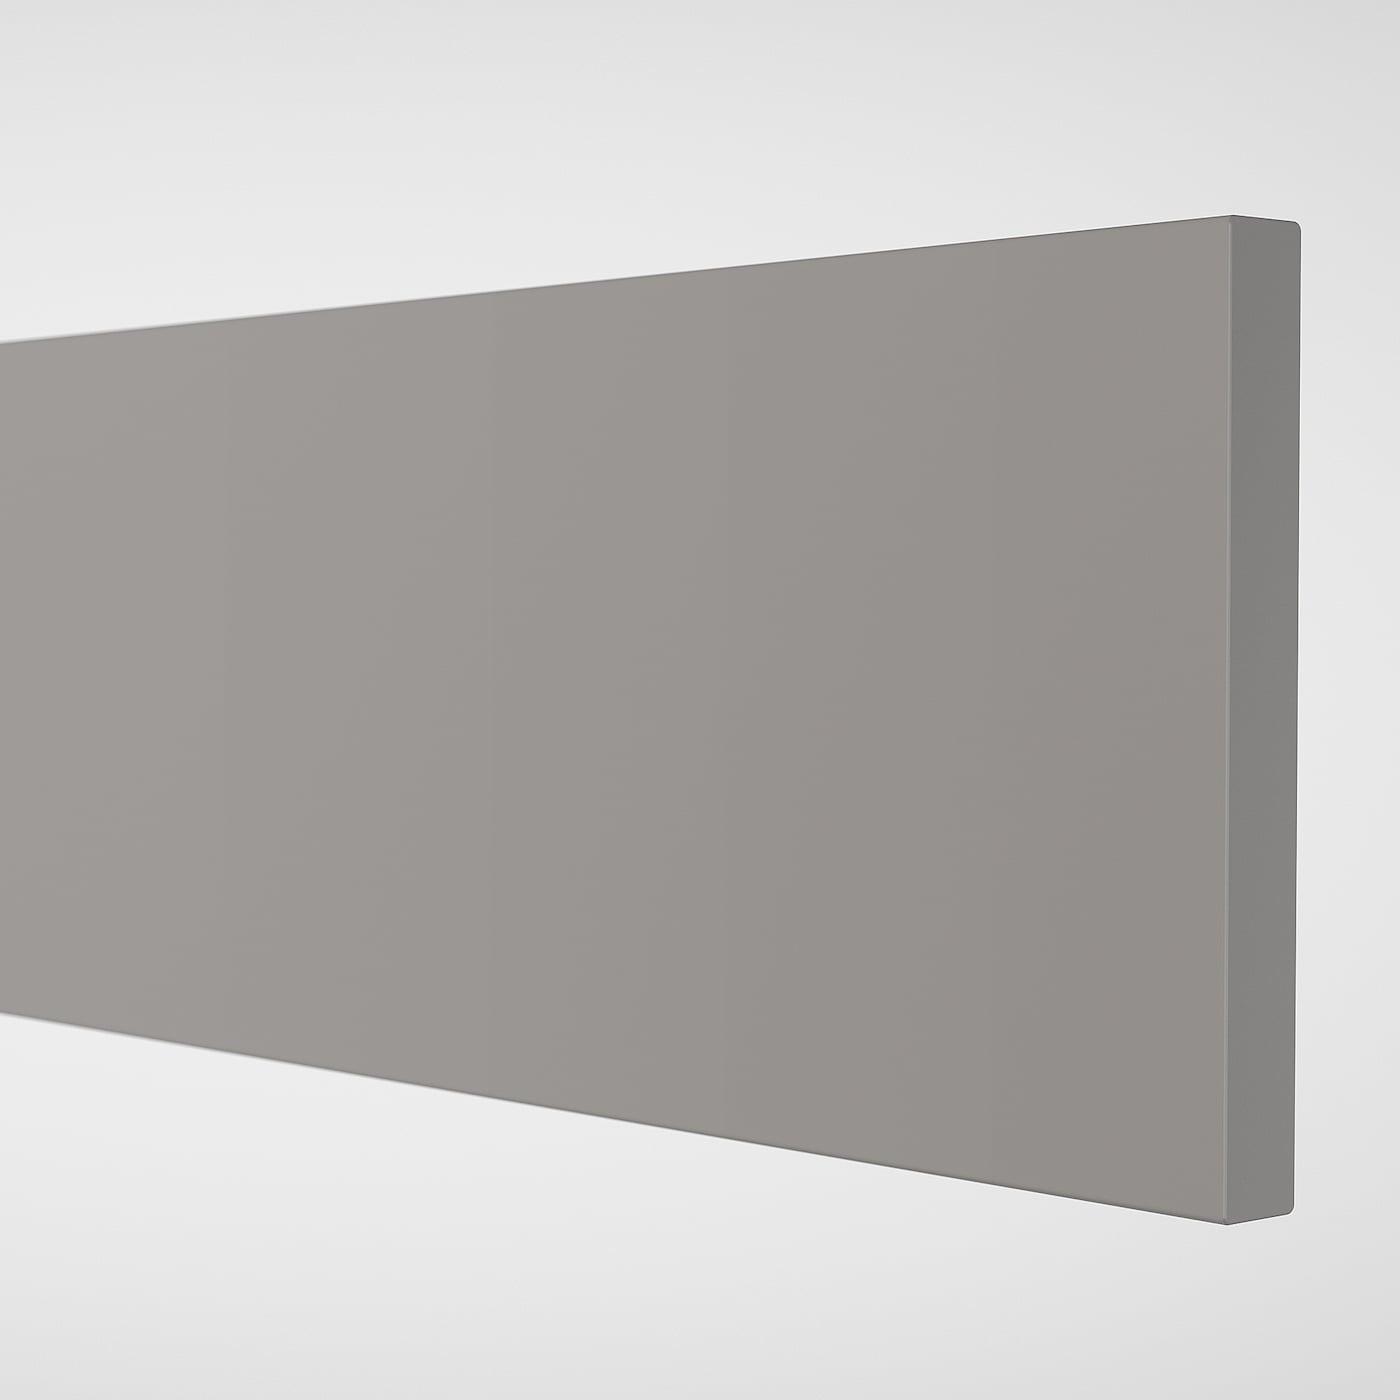 ENHET Drawer front for base cb f oven, grey, 60x14 cm